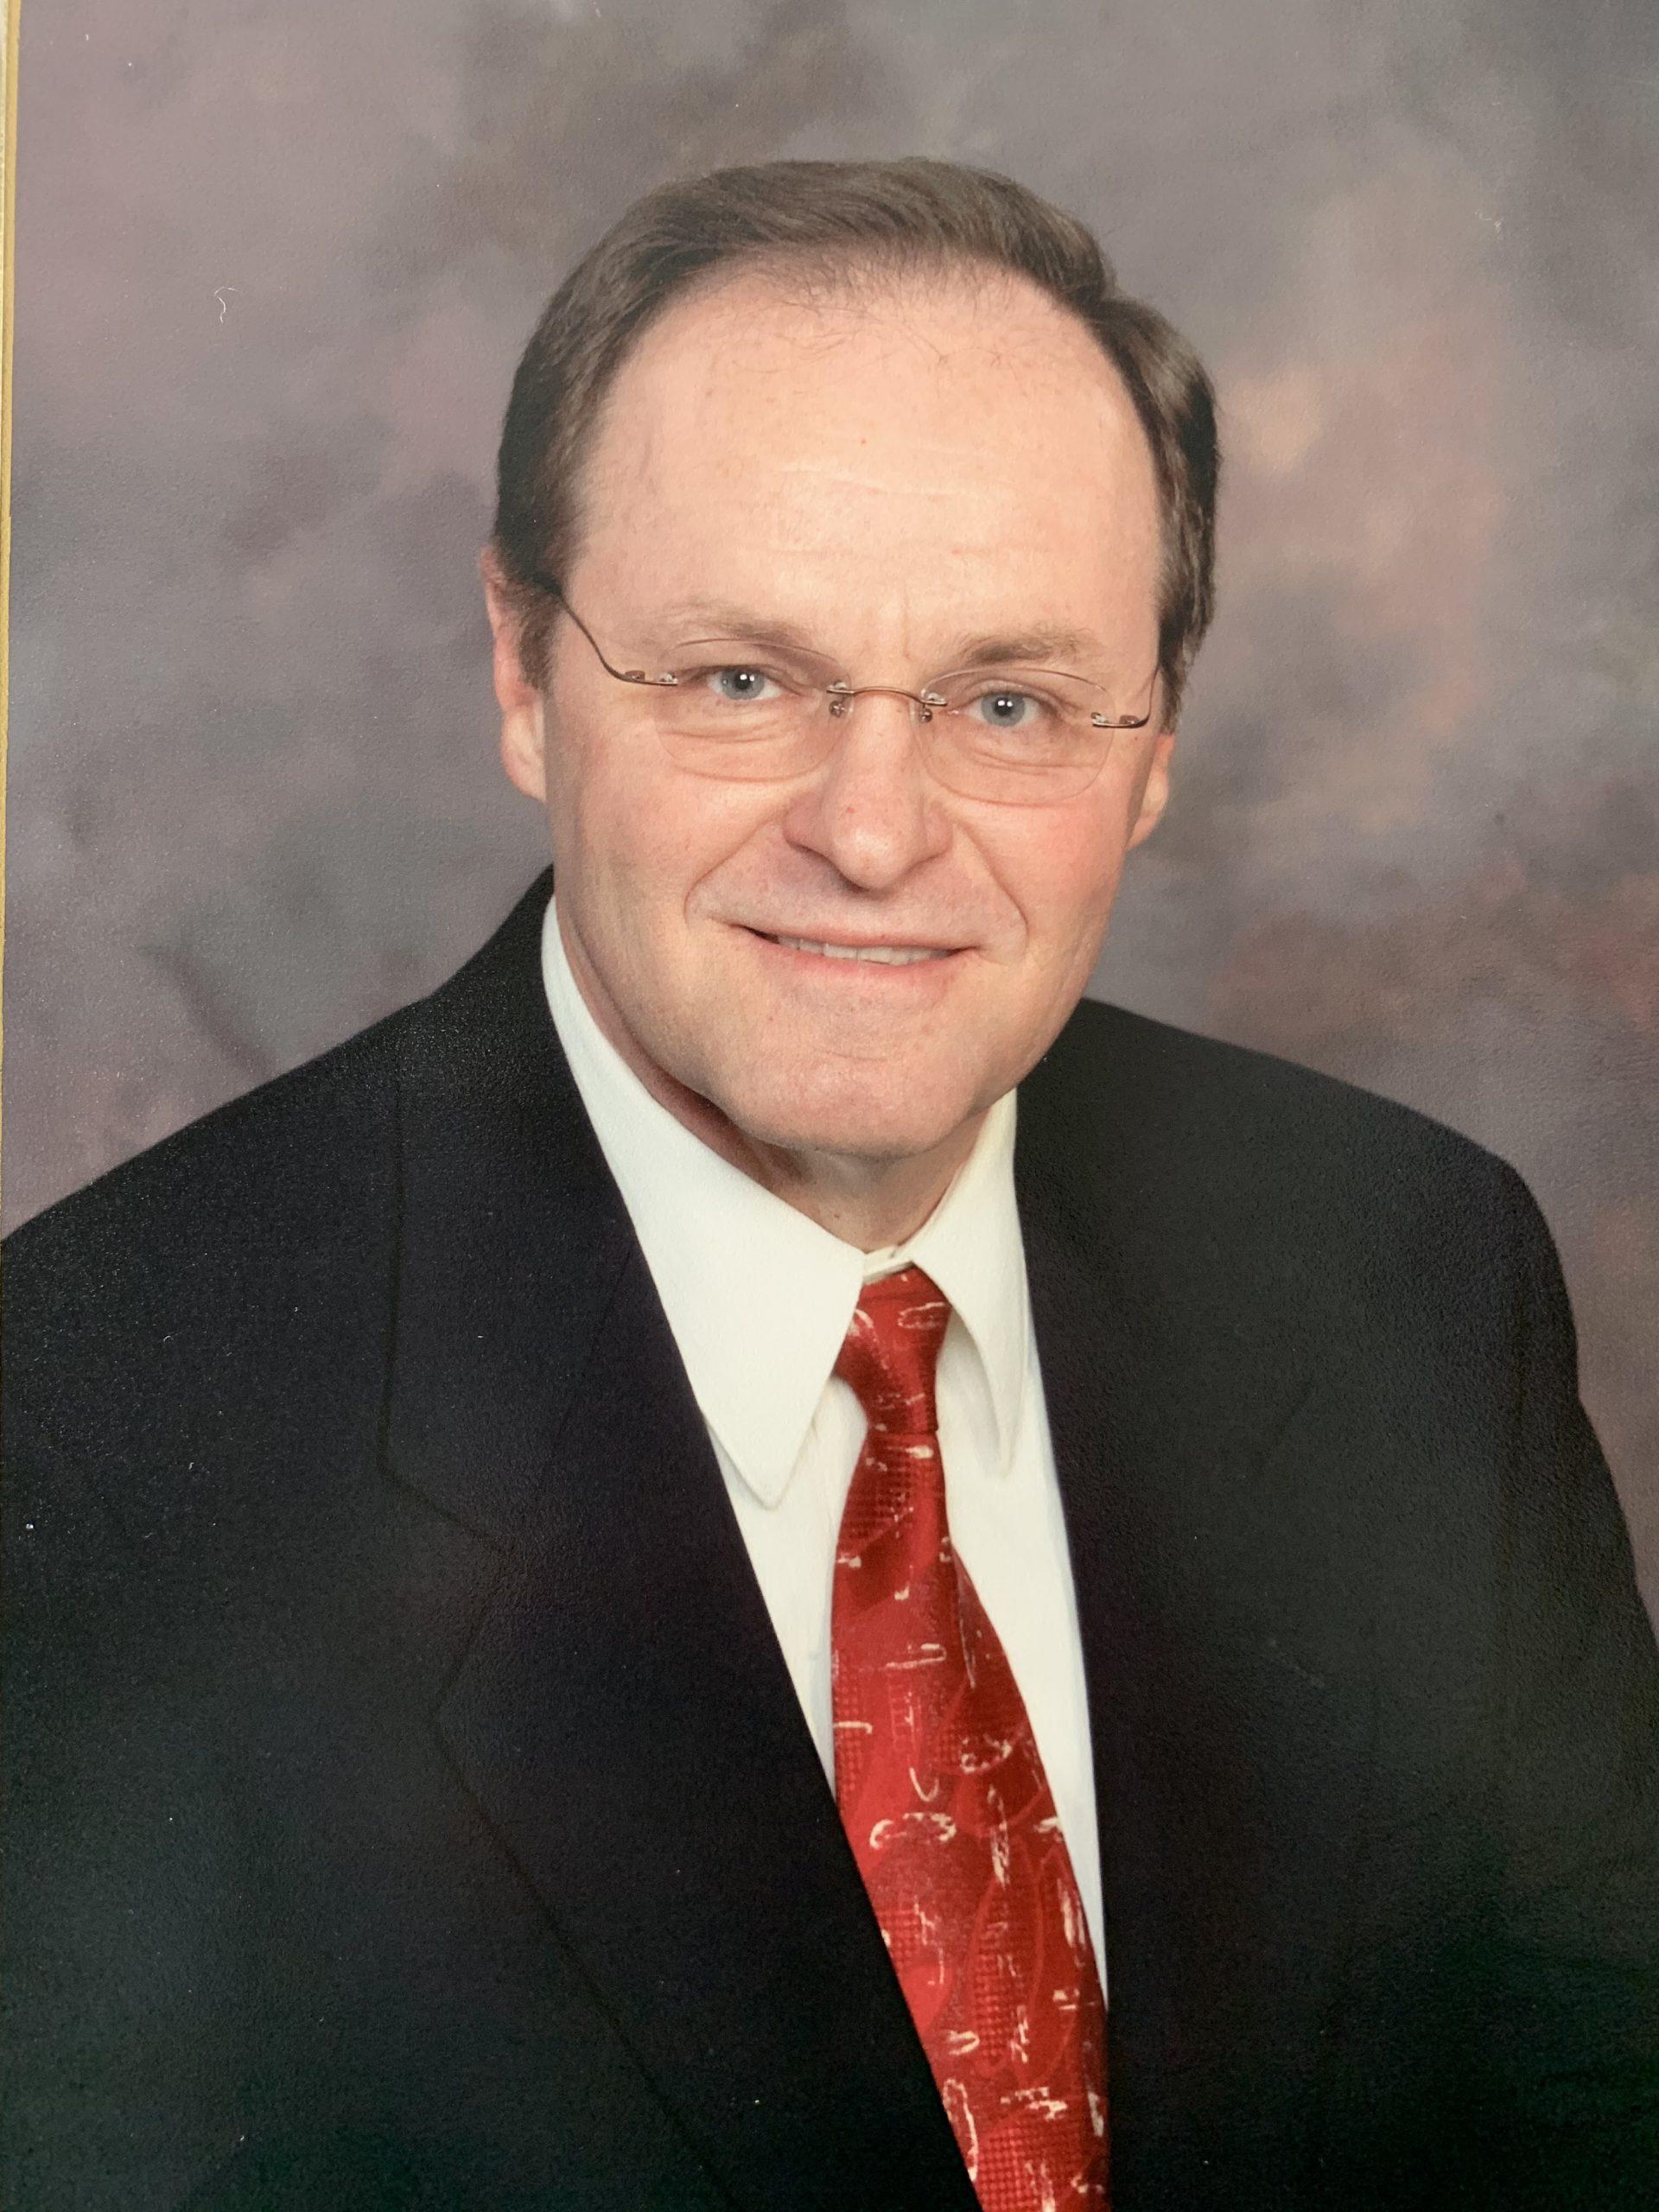 Gregory D. Scott – 69